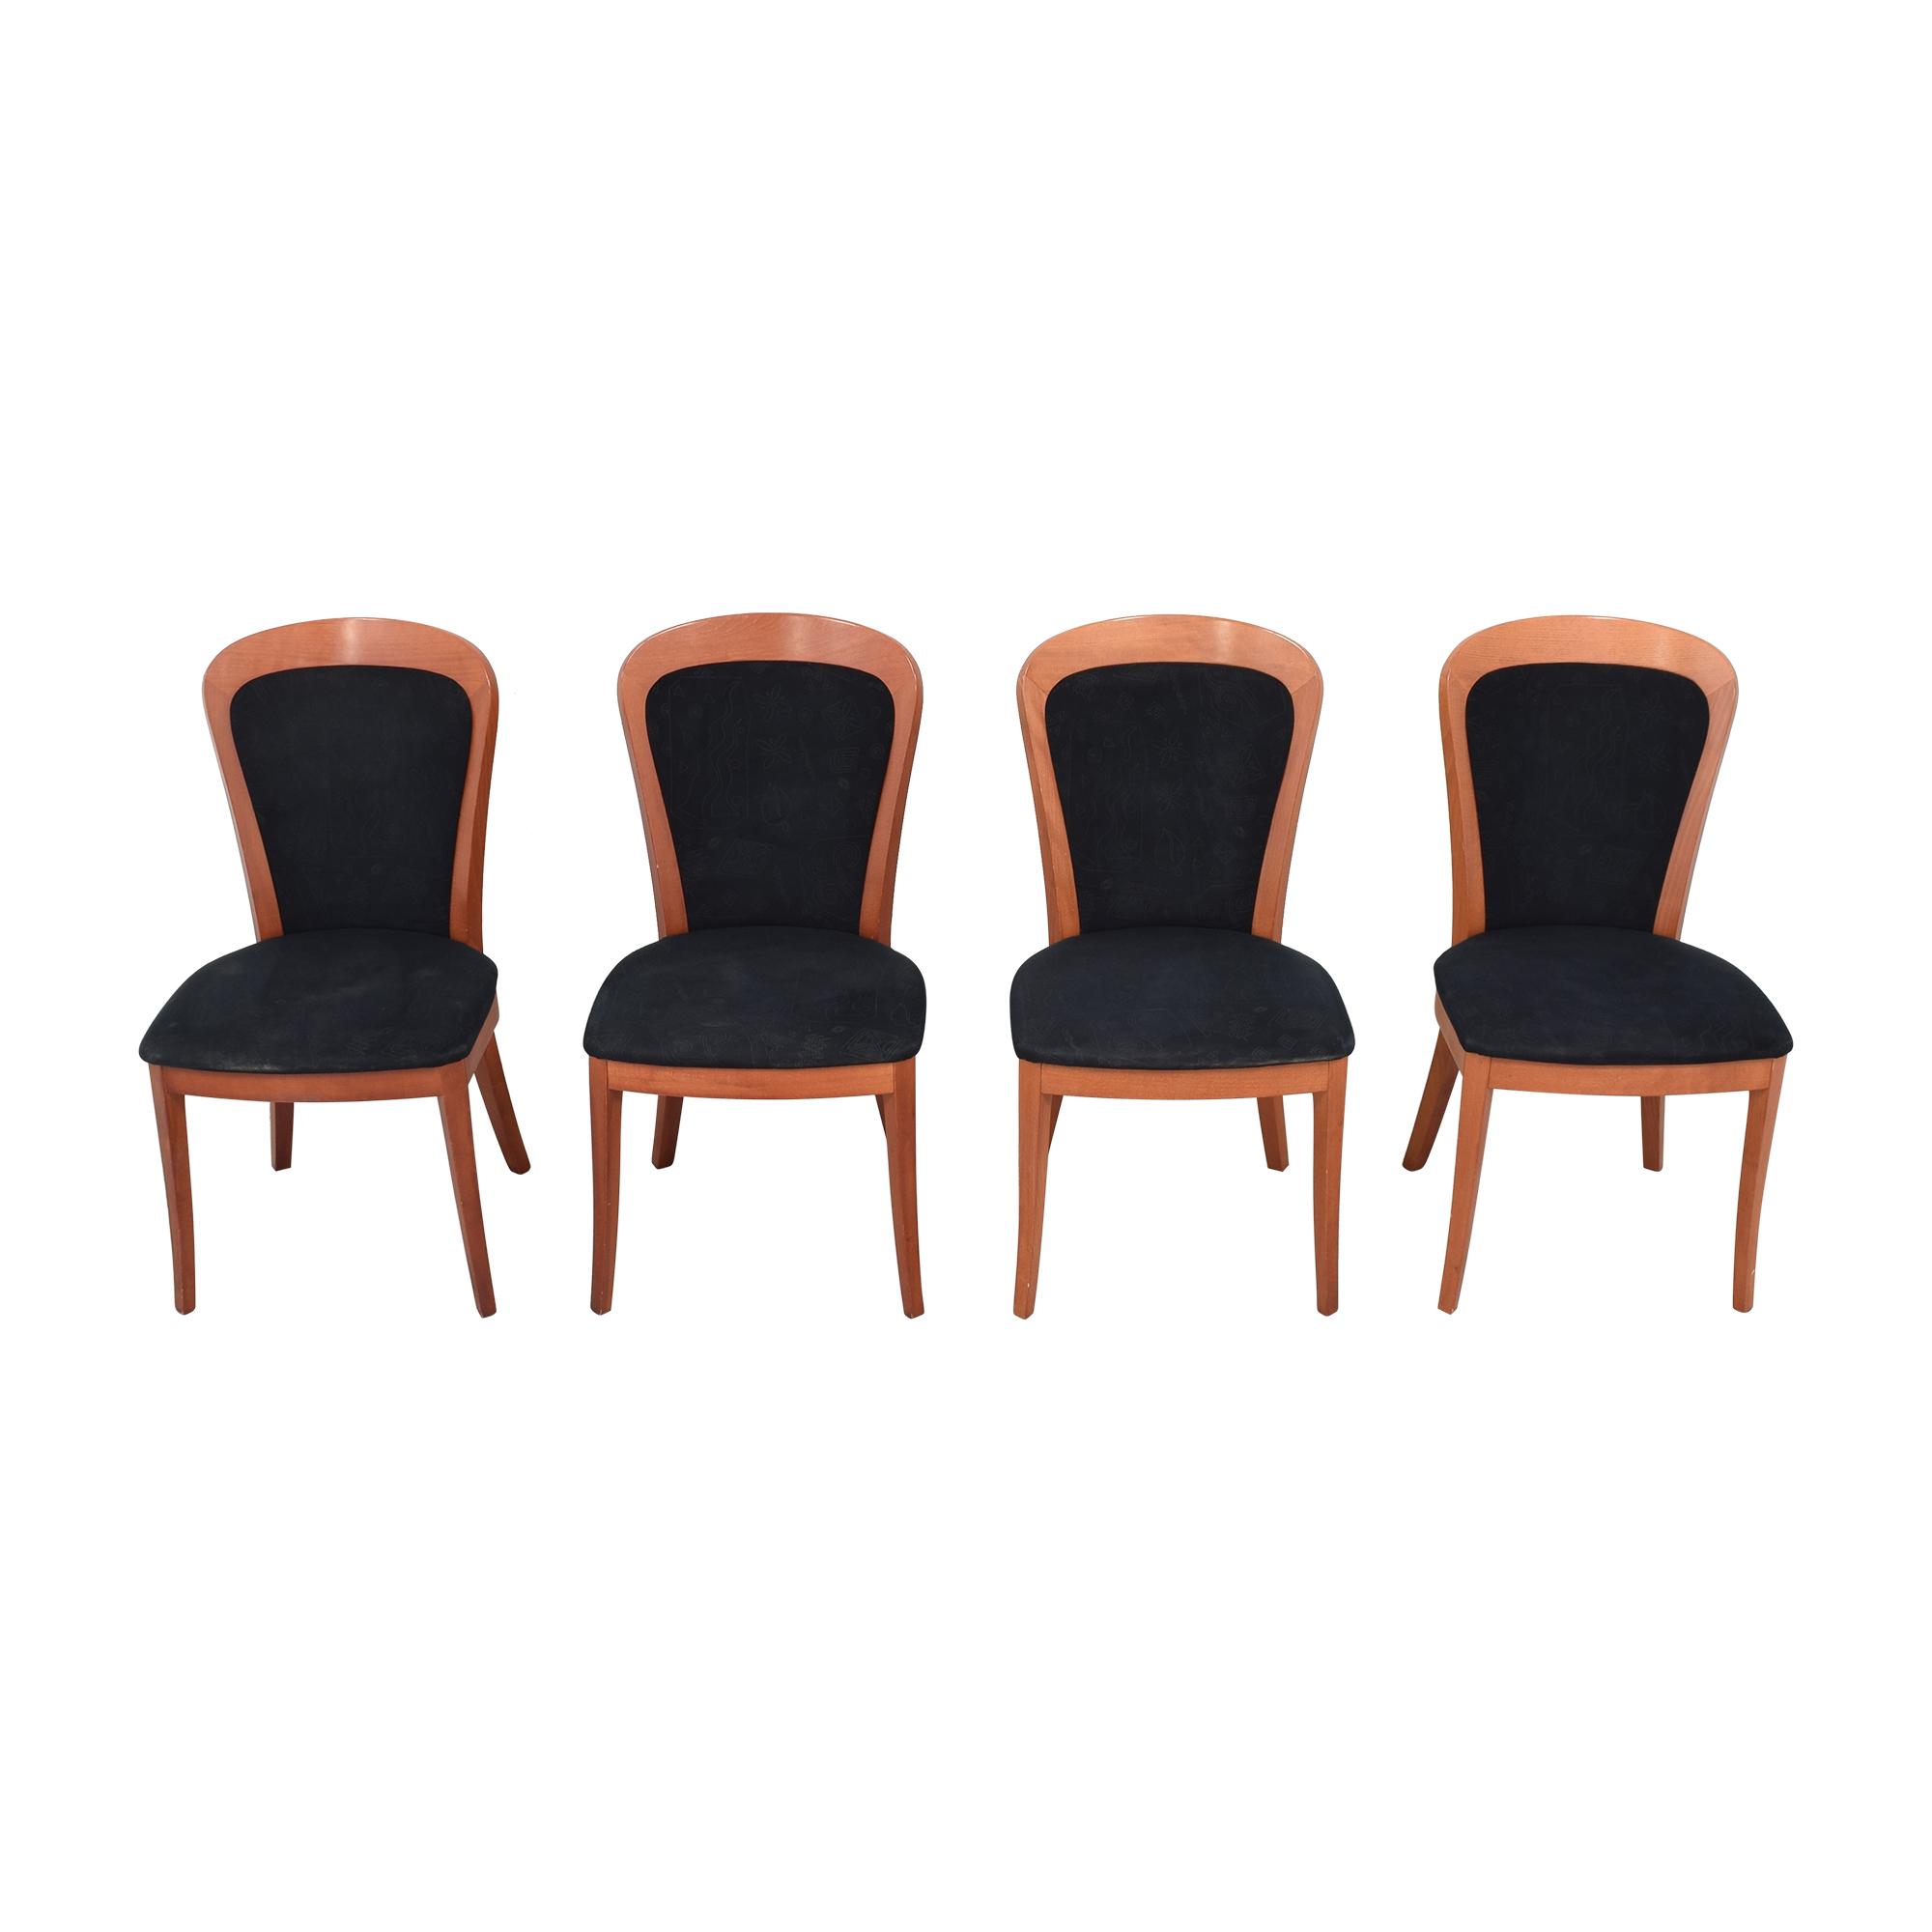 SA A. Sibau SA A. Sibau Dining Chairs coupon